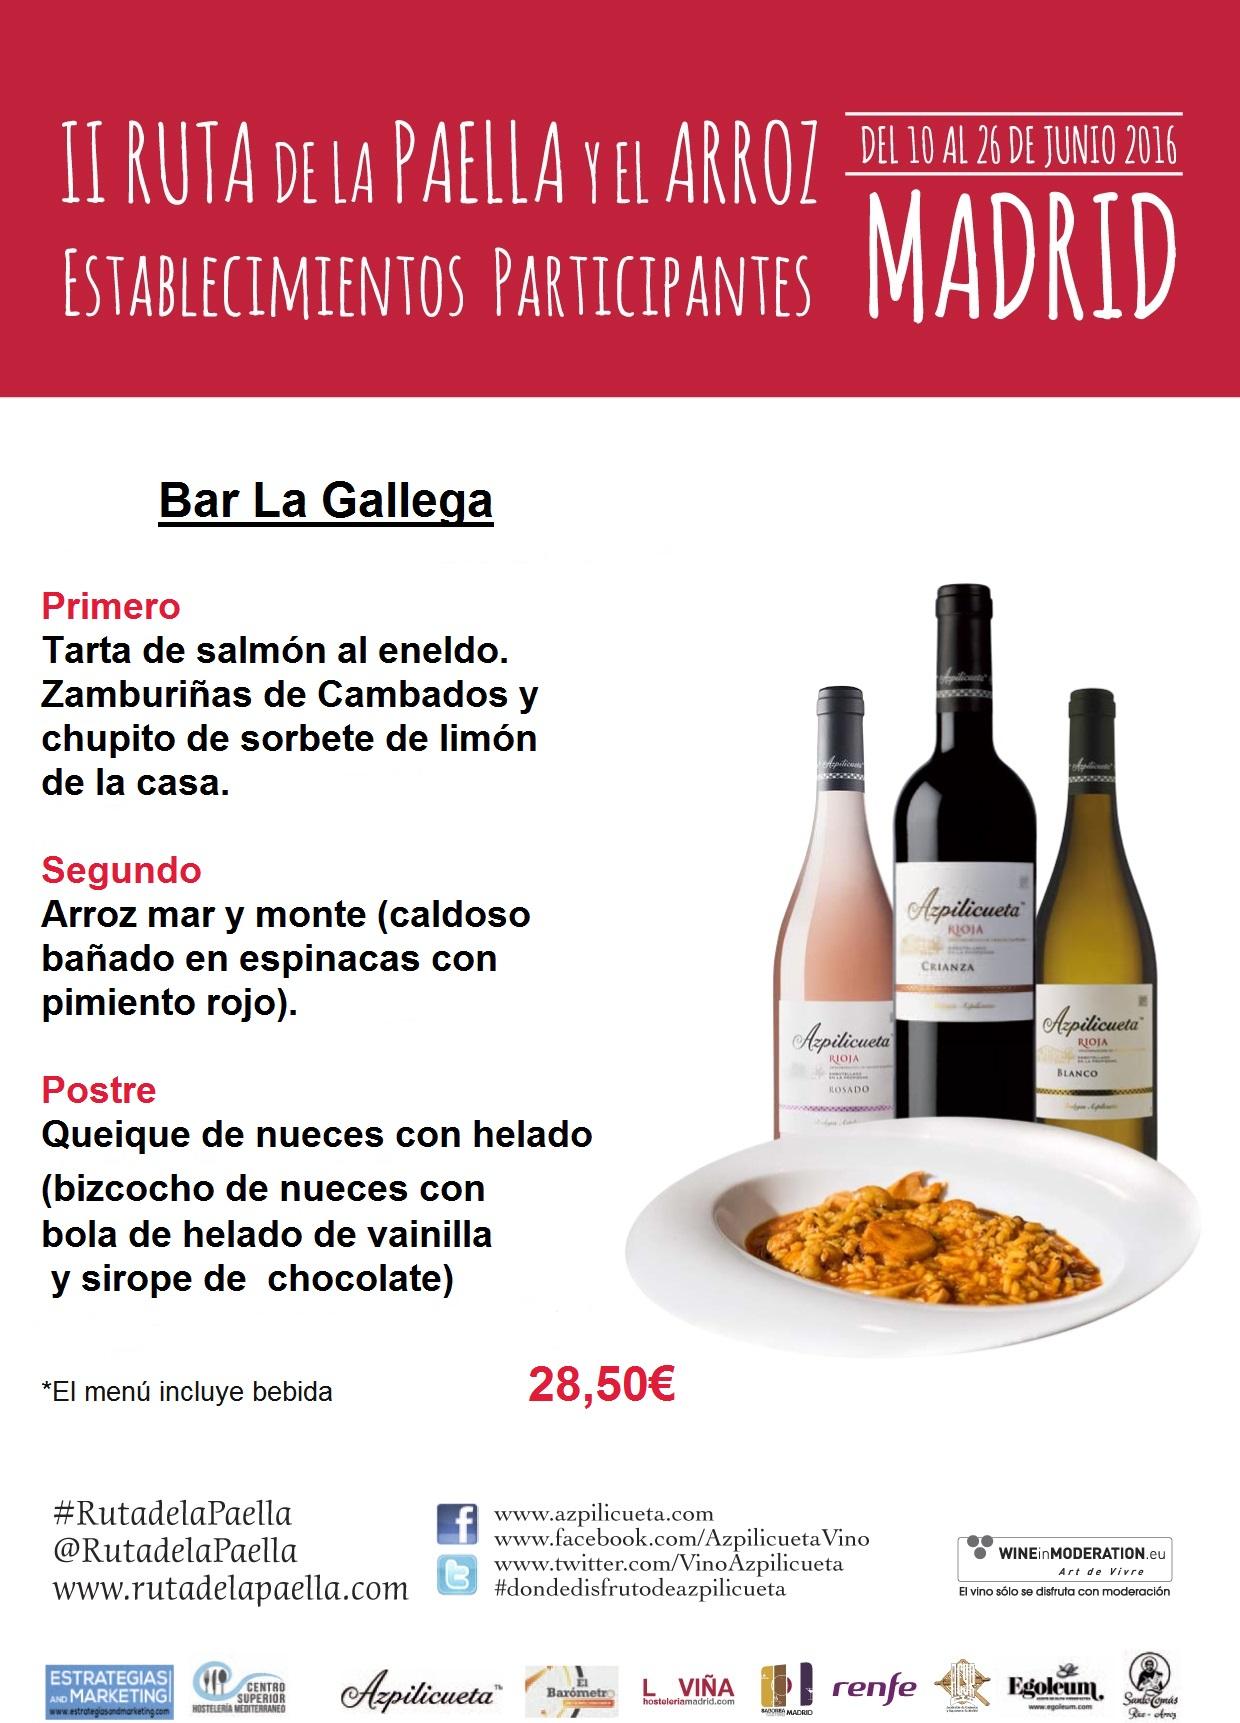 Bar La Gallega